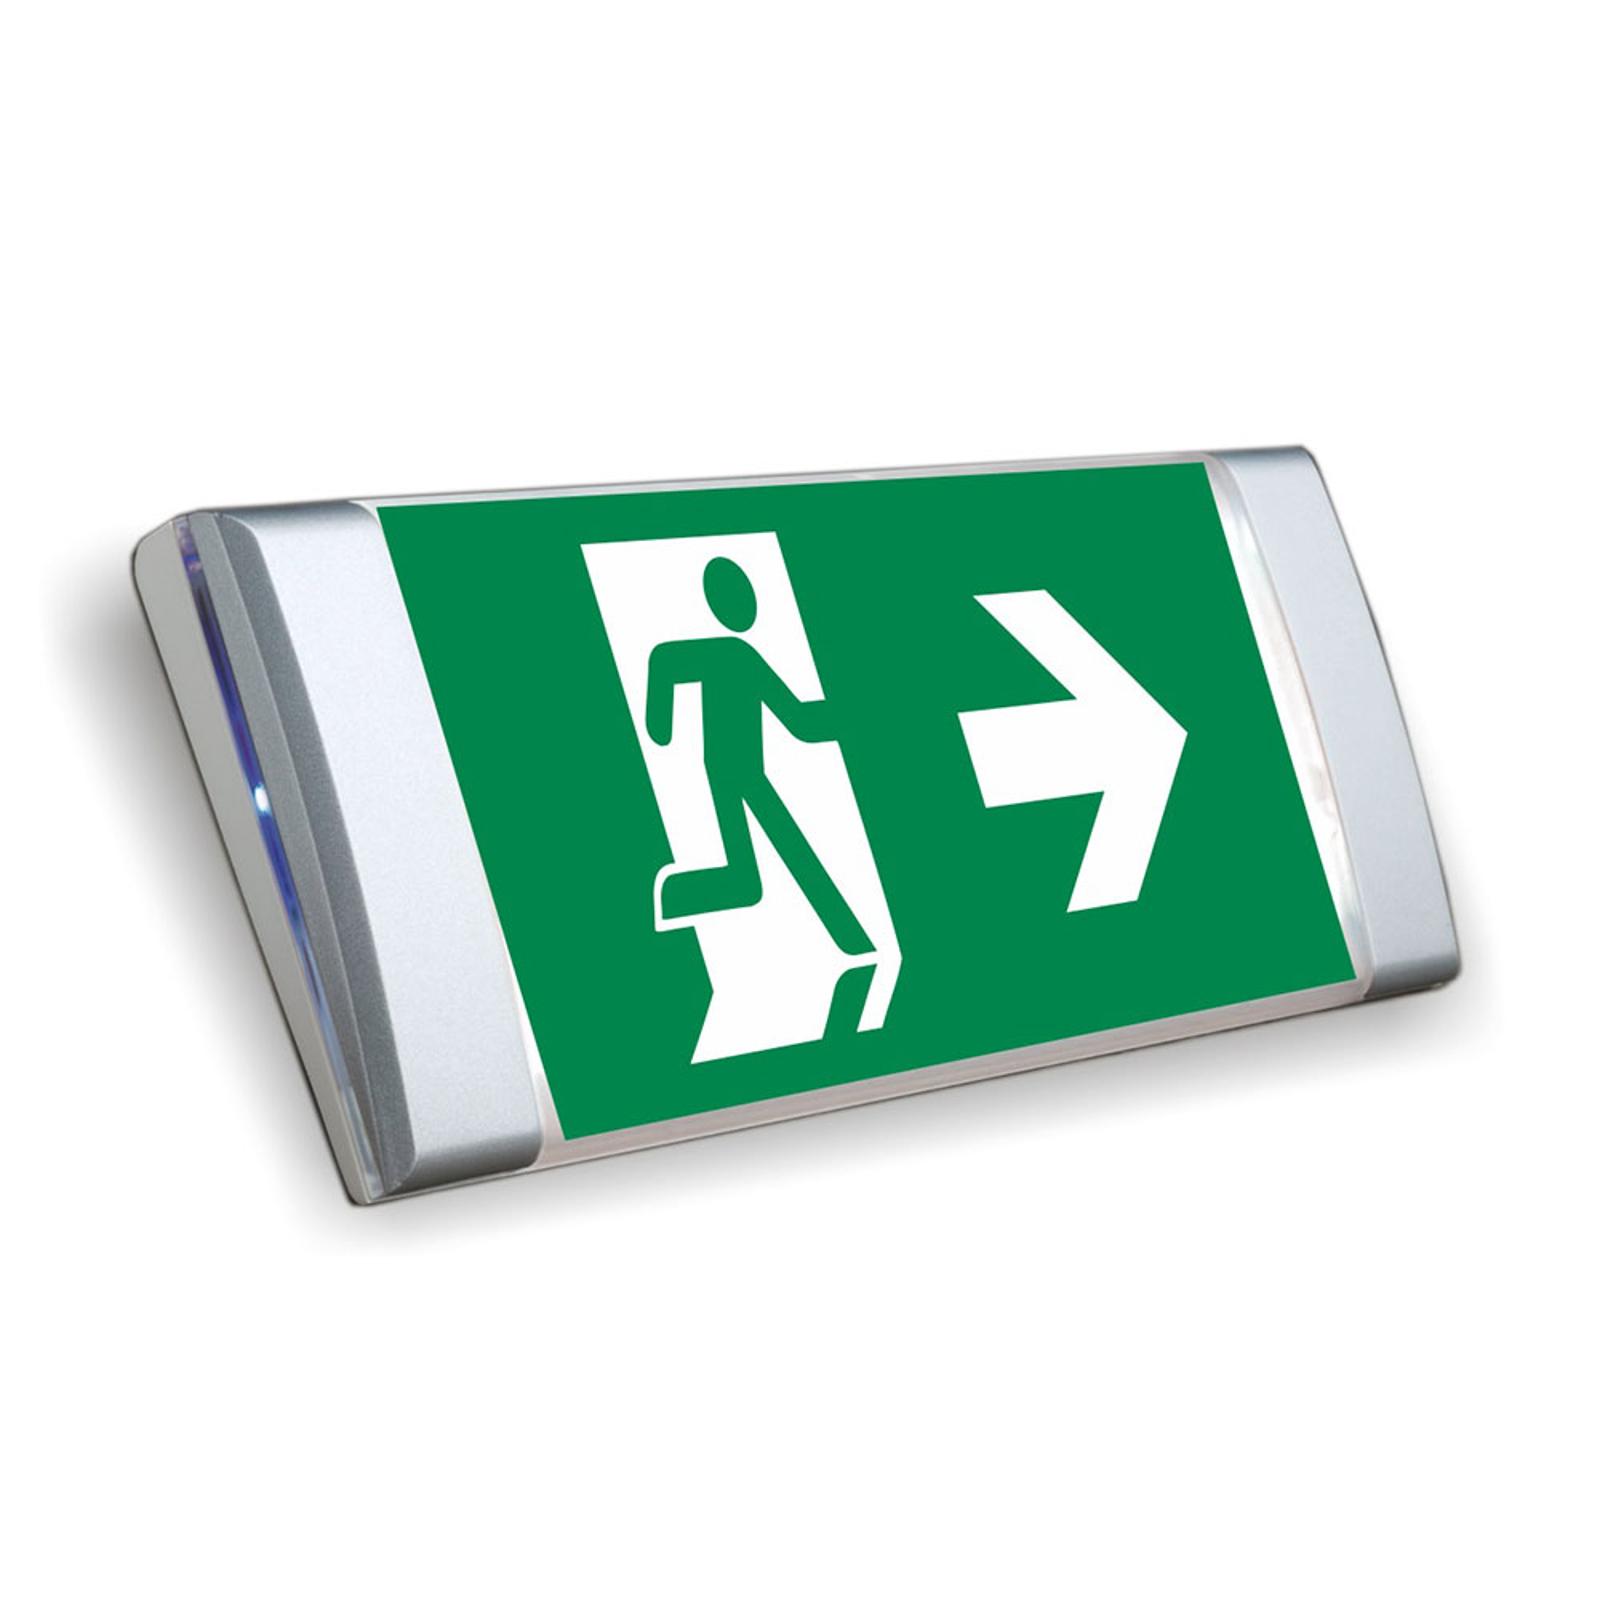 Flat LED emergency wall light, aluminium finish_3002227_1